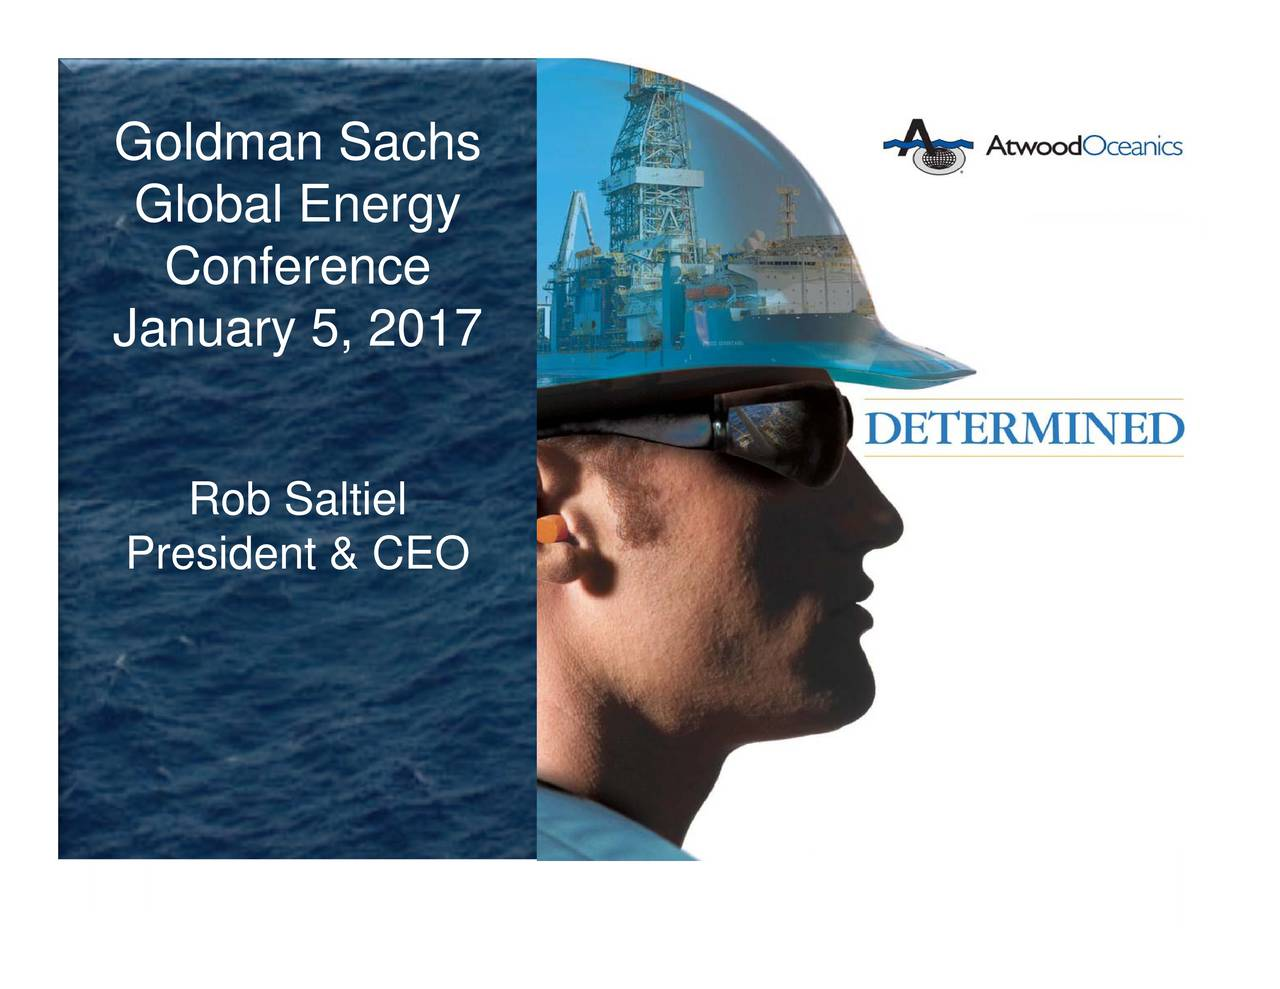 Goldman SJanuary 5, 2017dent & CEO 1